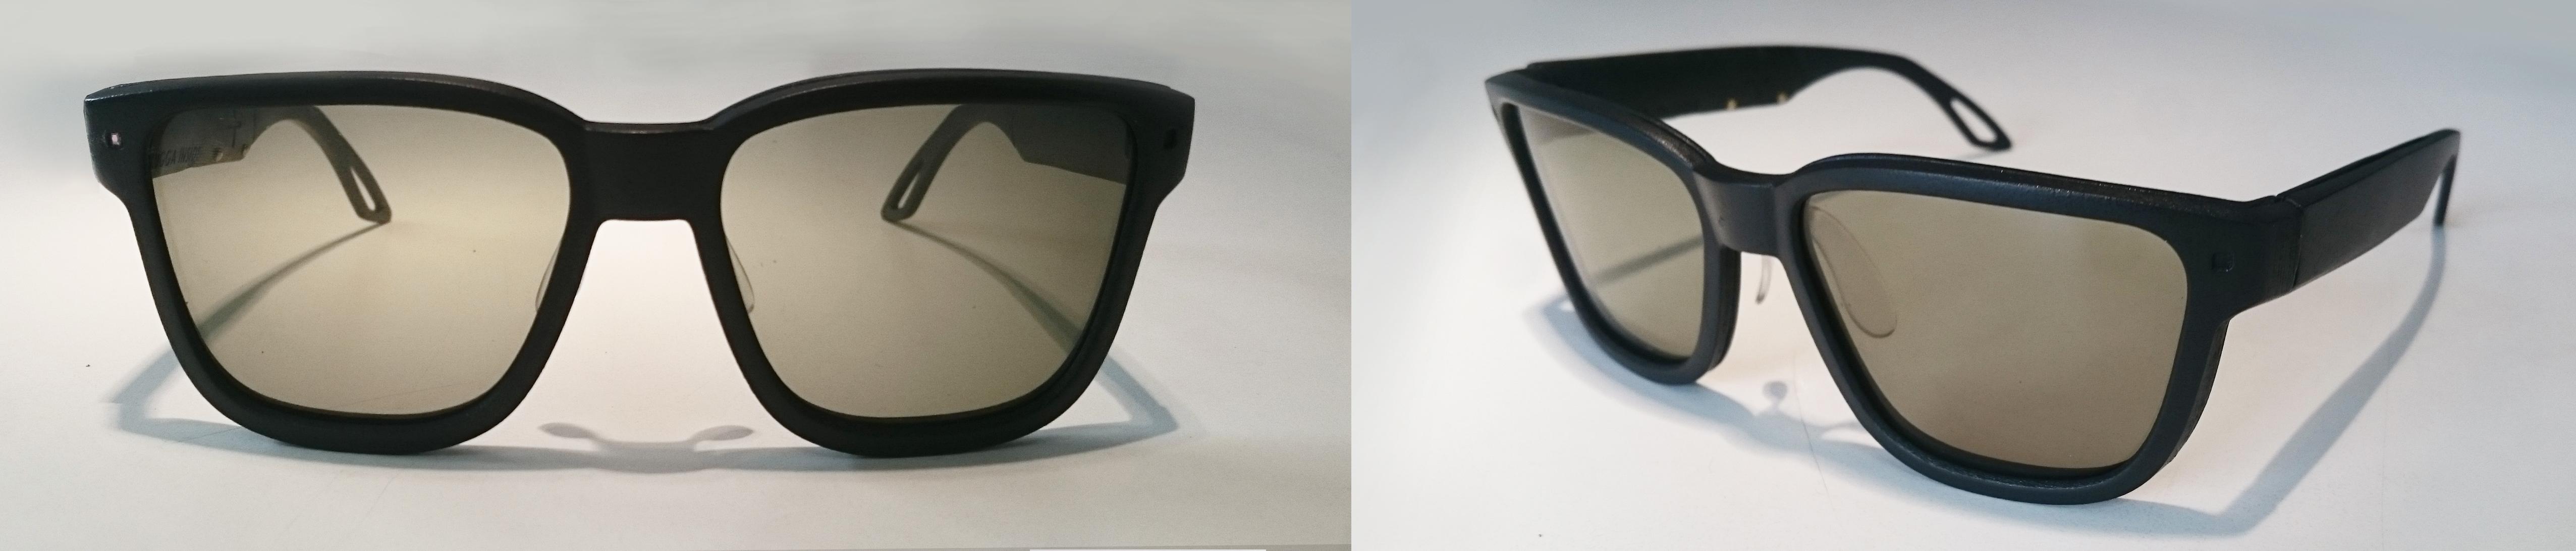 new prototypes skugga eyewear